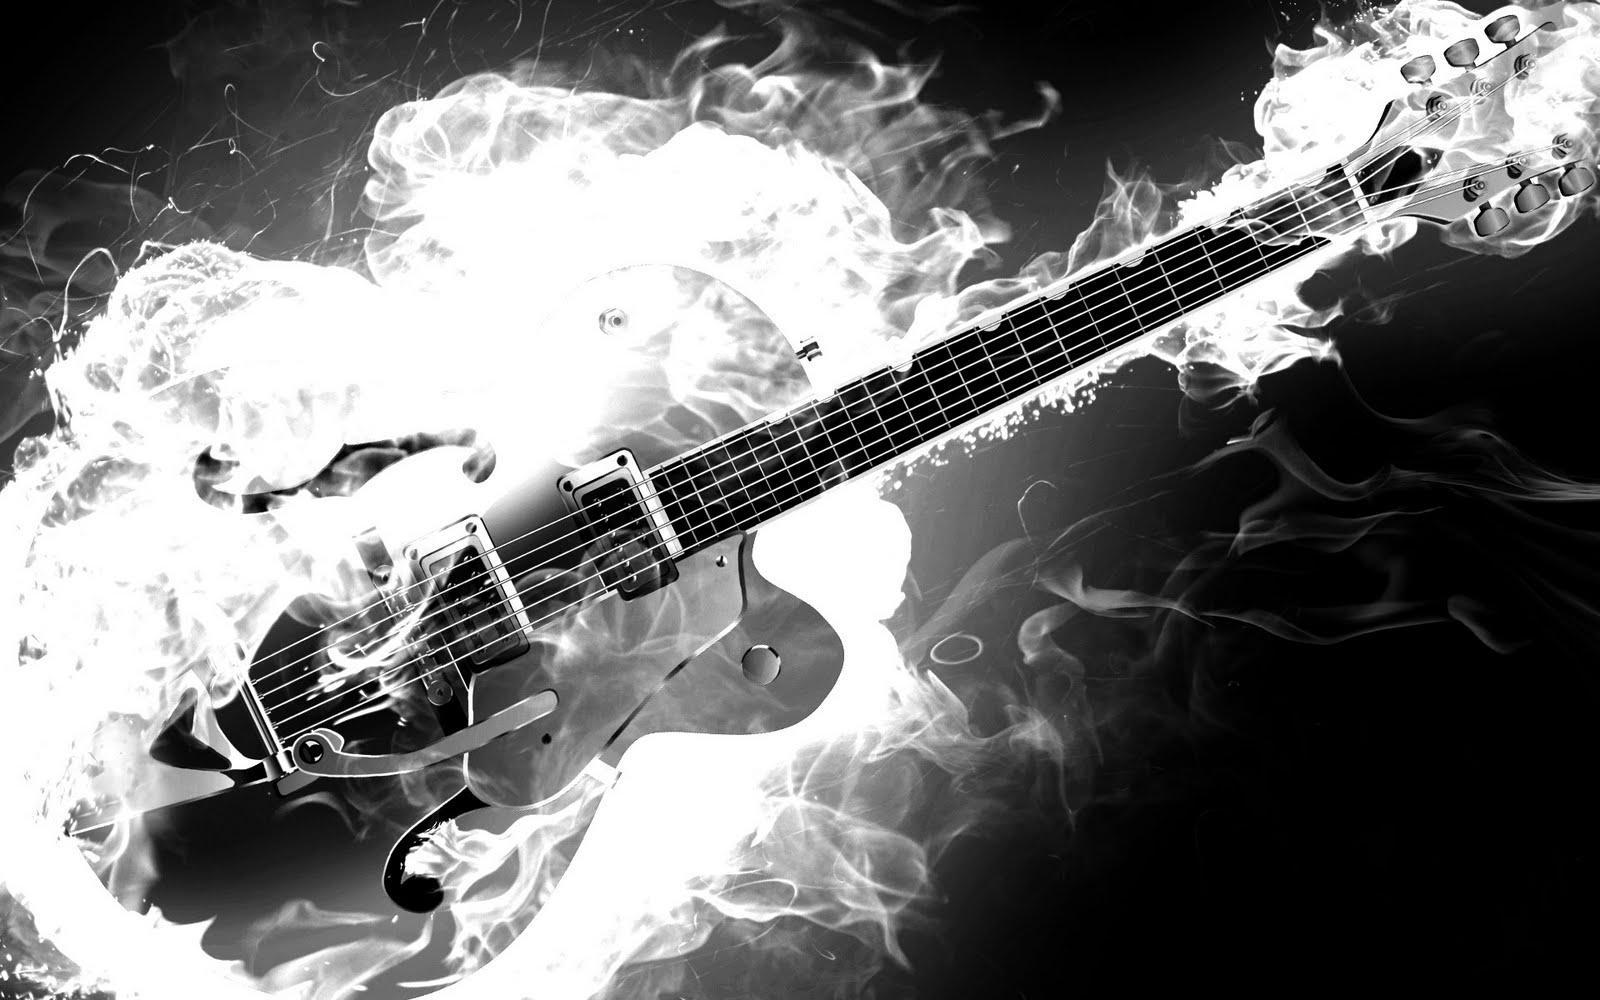 guitar full collor hd - photo #27